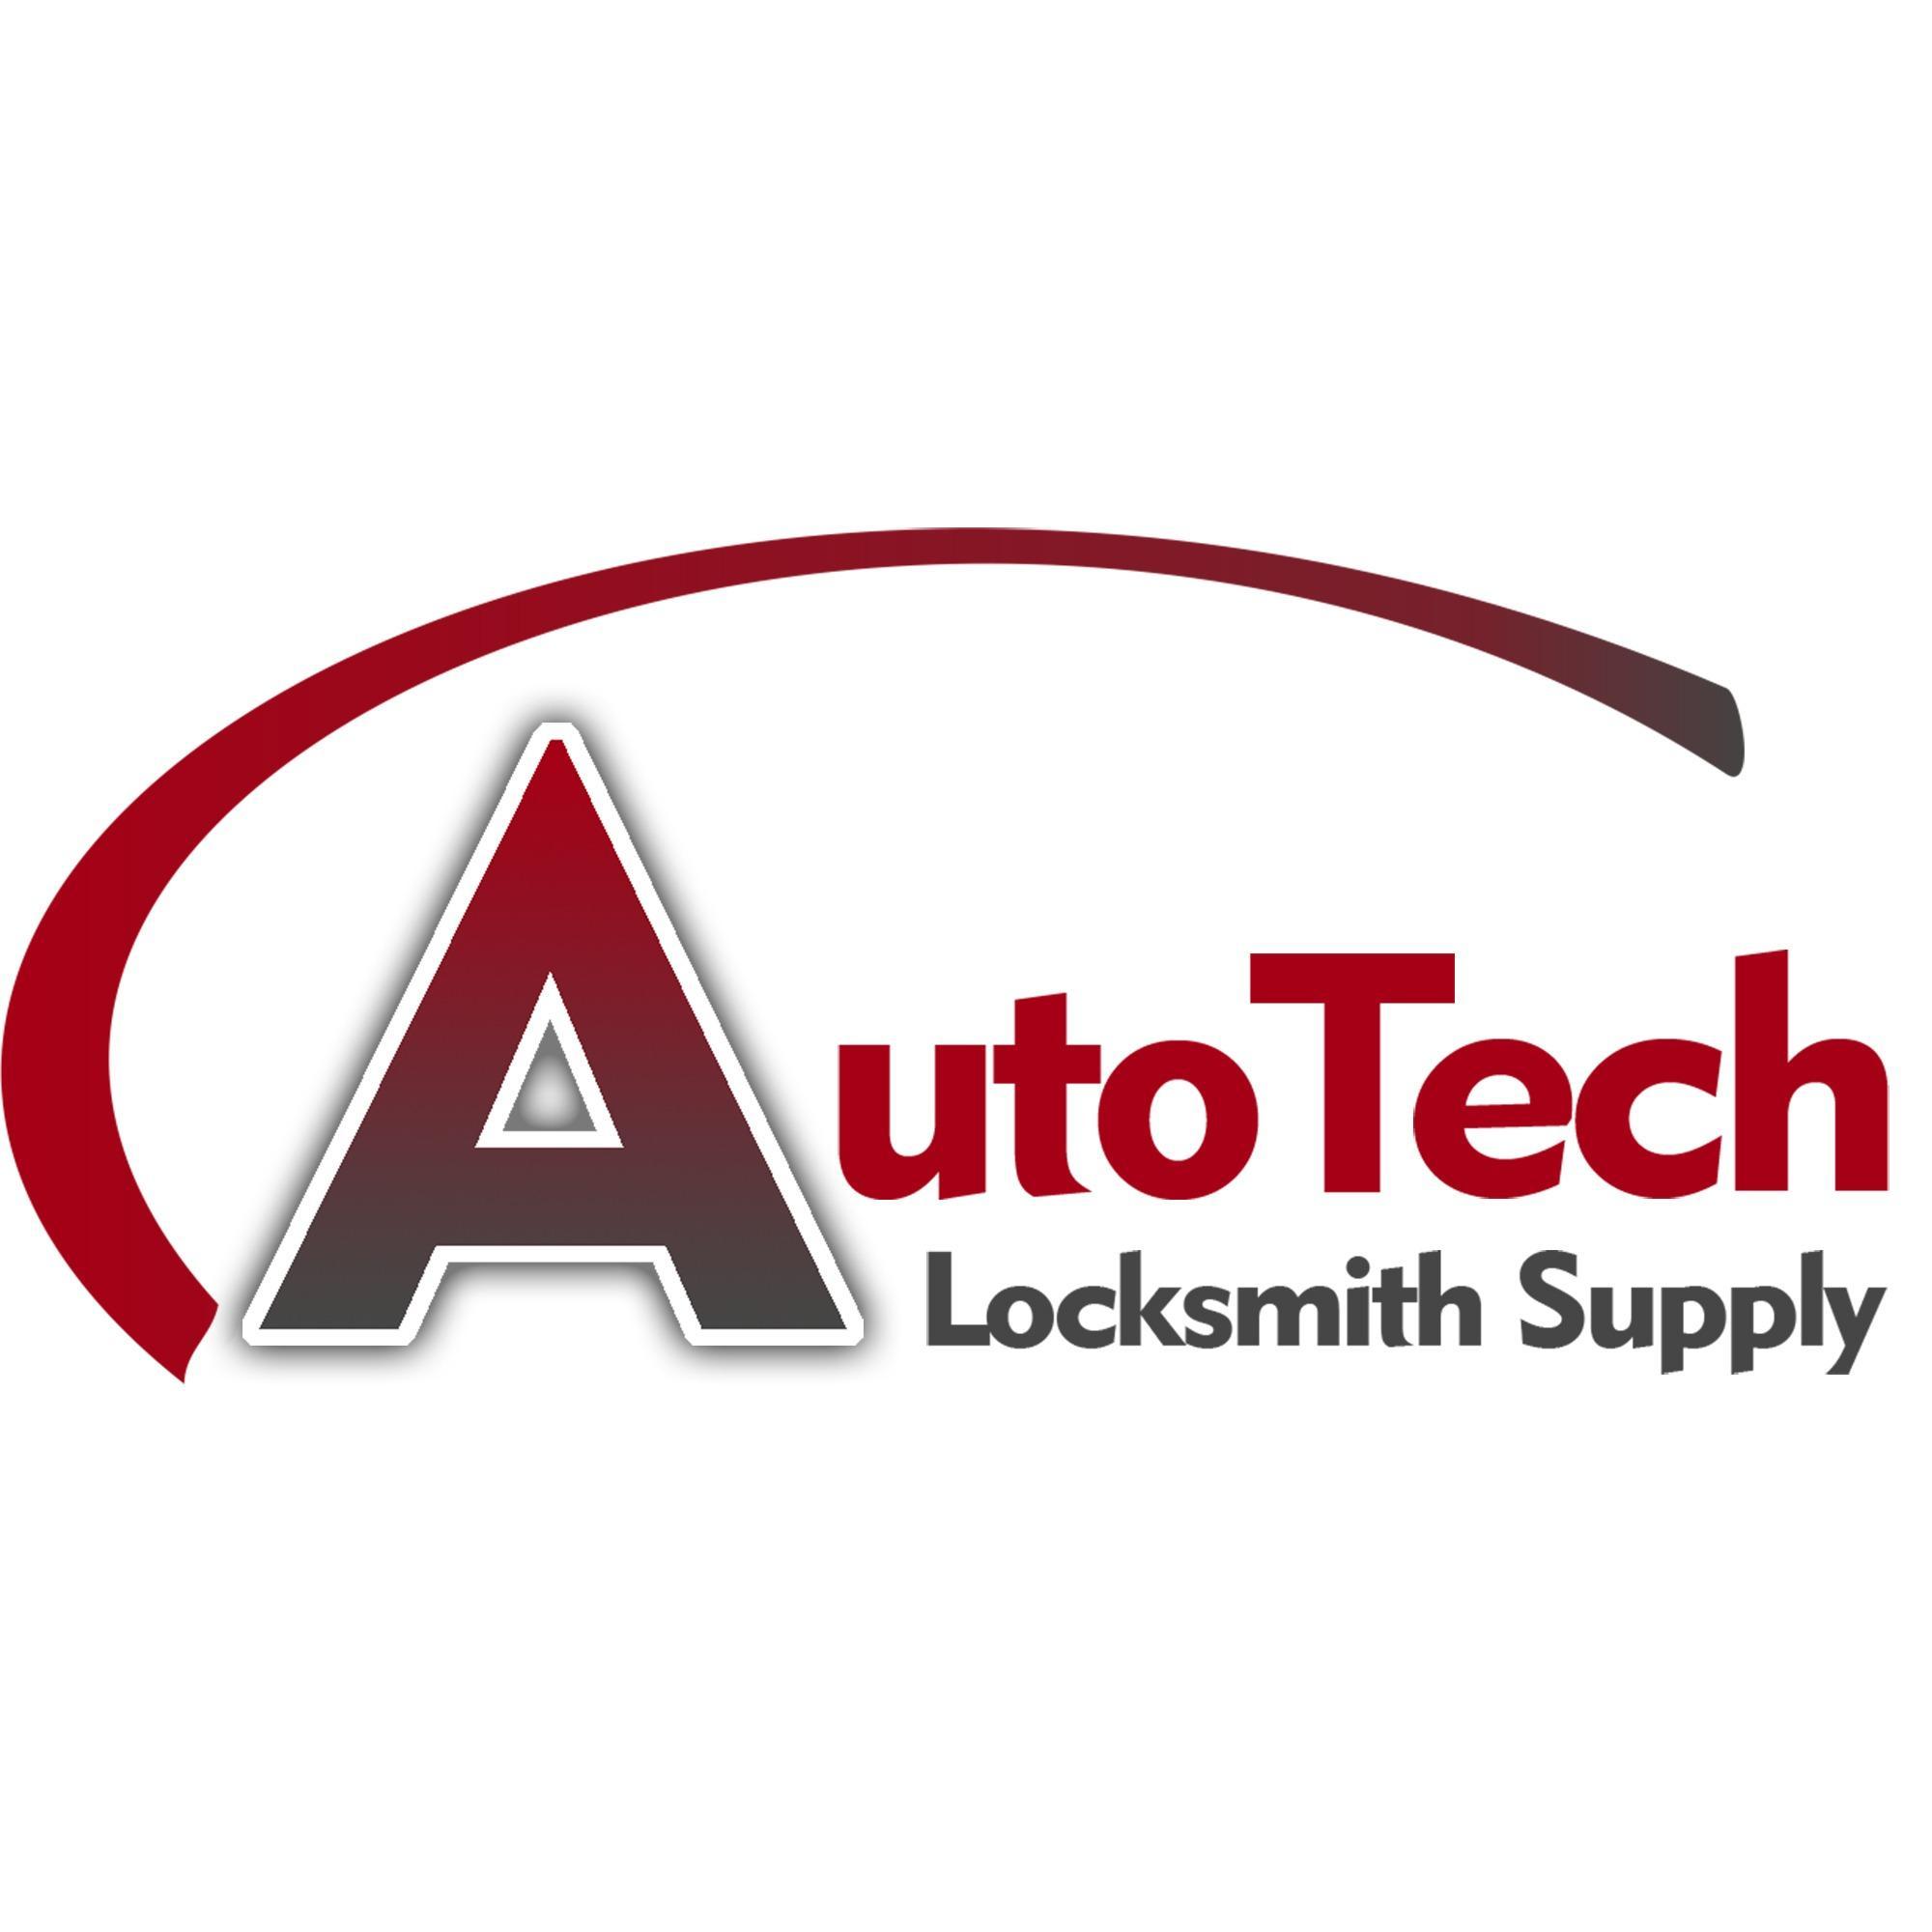 Auto Tech Locksmith Supply, Inc.